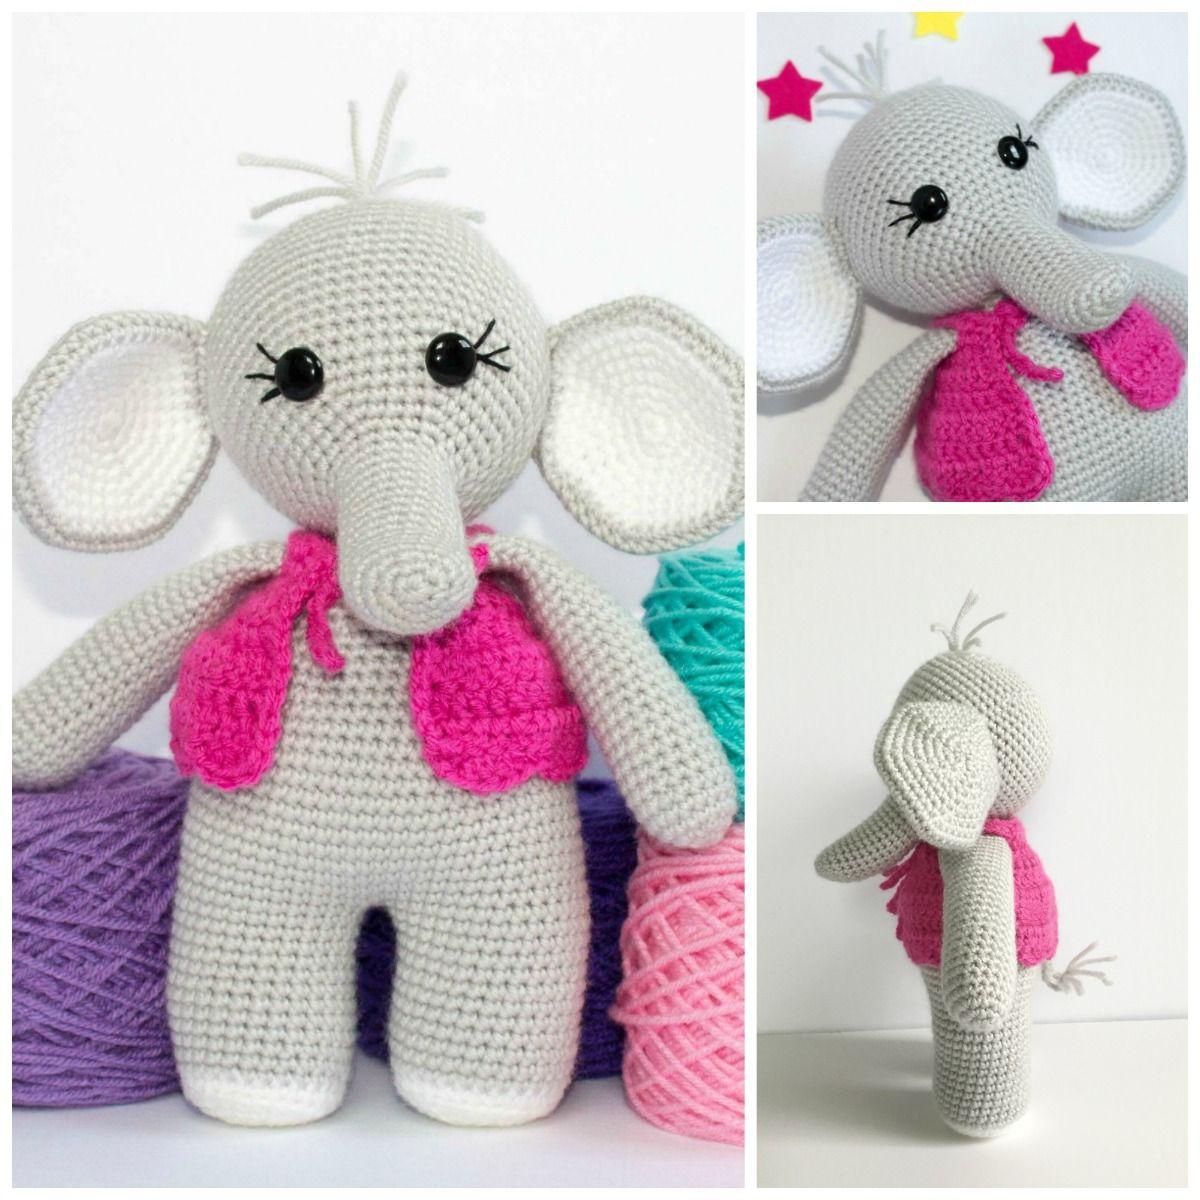 This free elephant crochet pattern has been a long work in progress ...